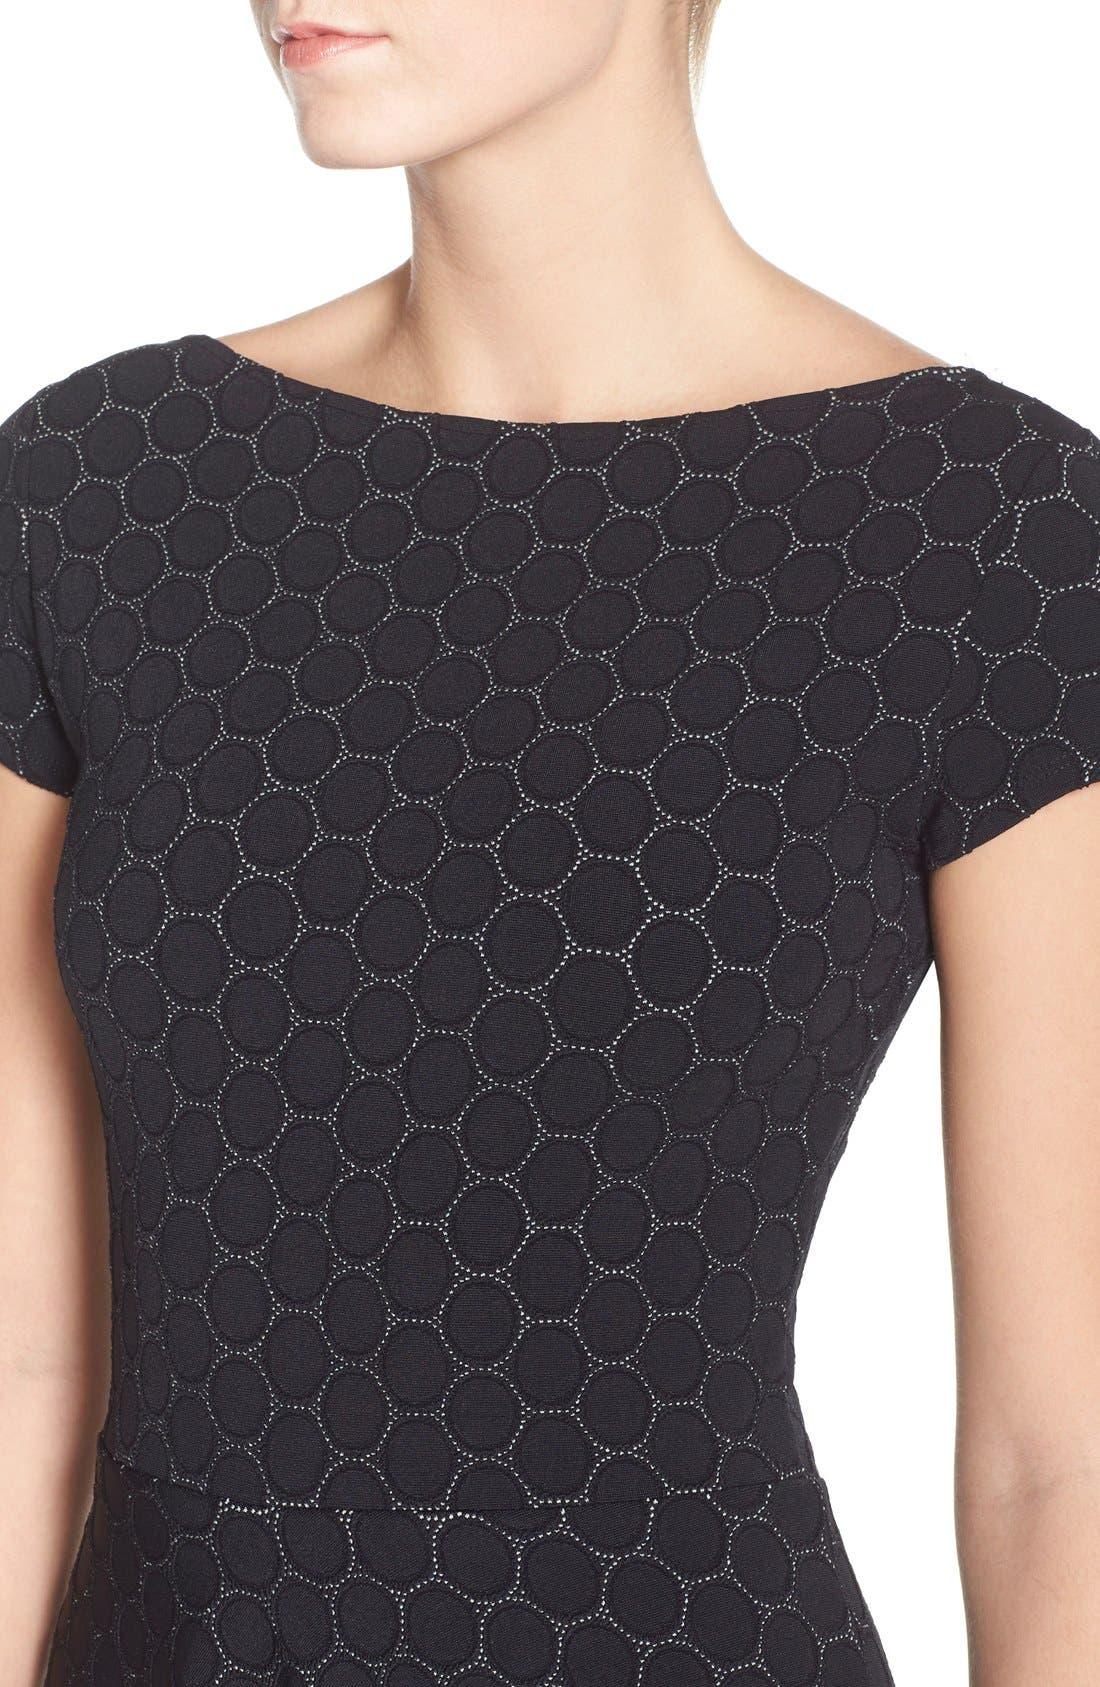 LEOTA, 'Circle' Jacquard Woven Jersey Dress, Alternate thumbnail 4, color, BLACK CAMEO CLOTH